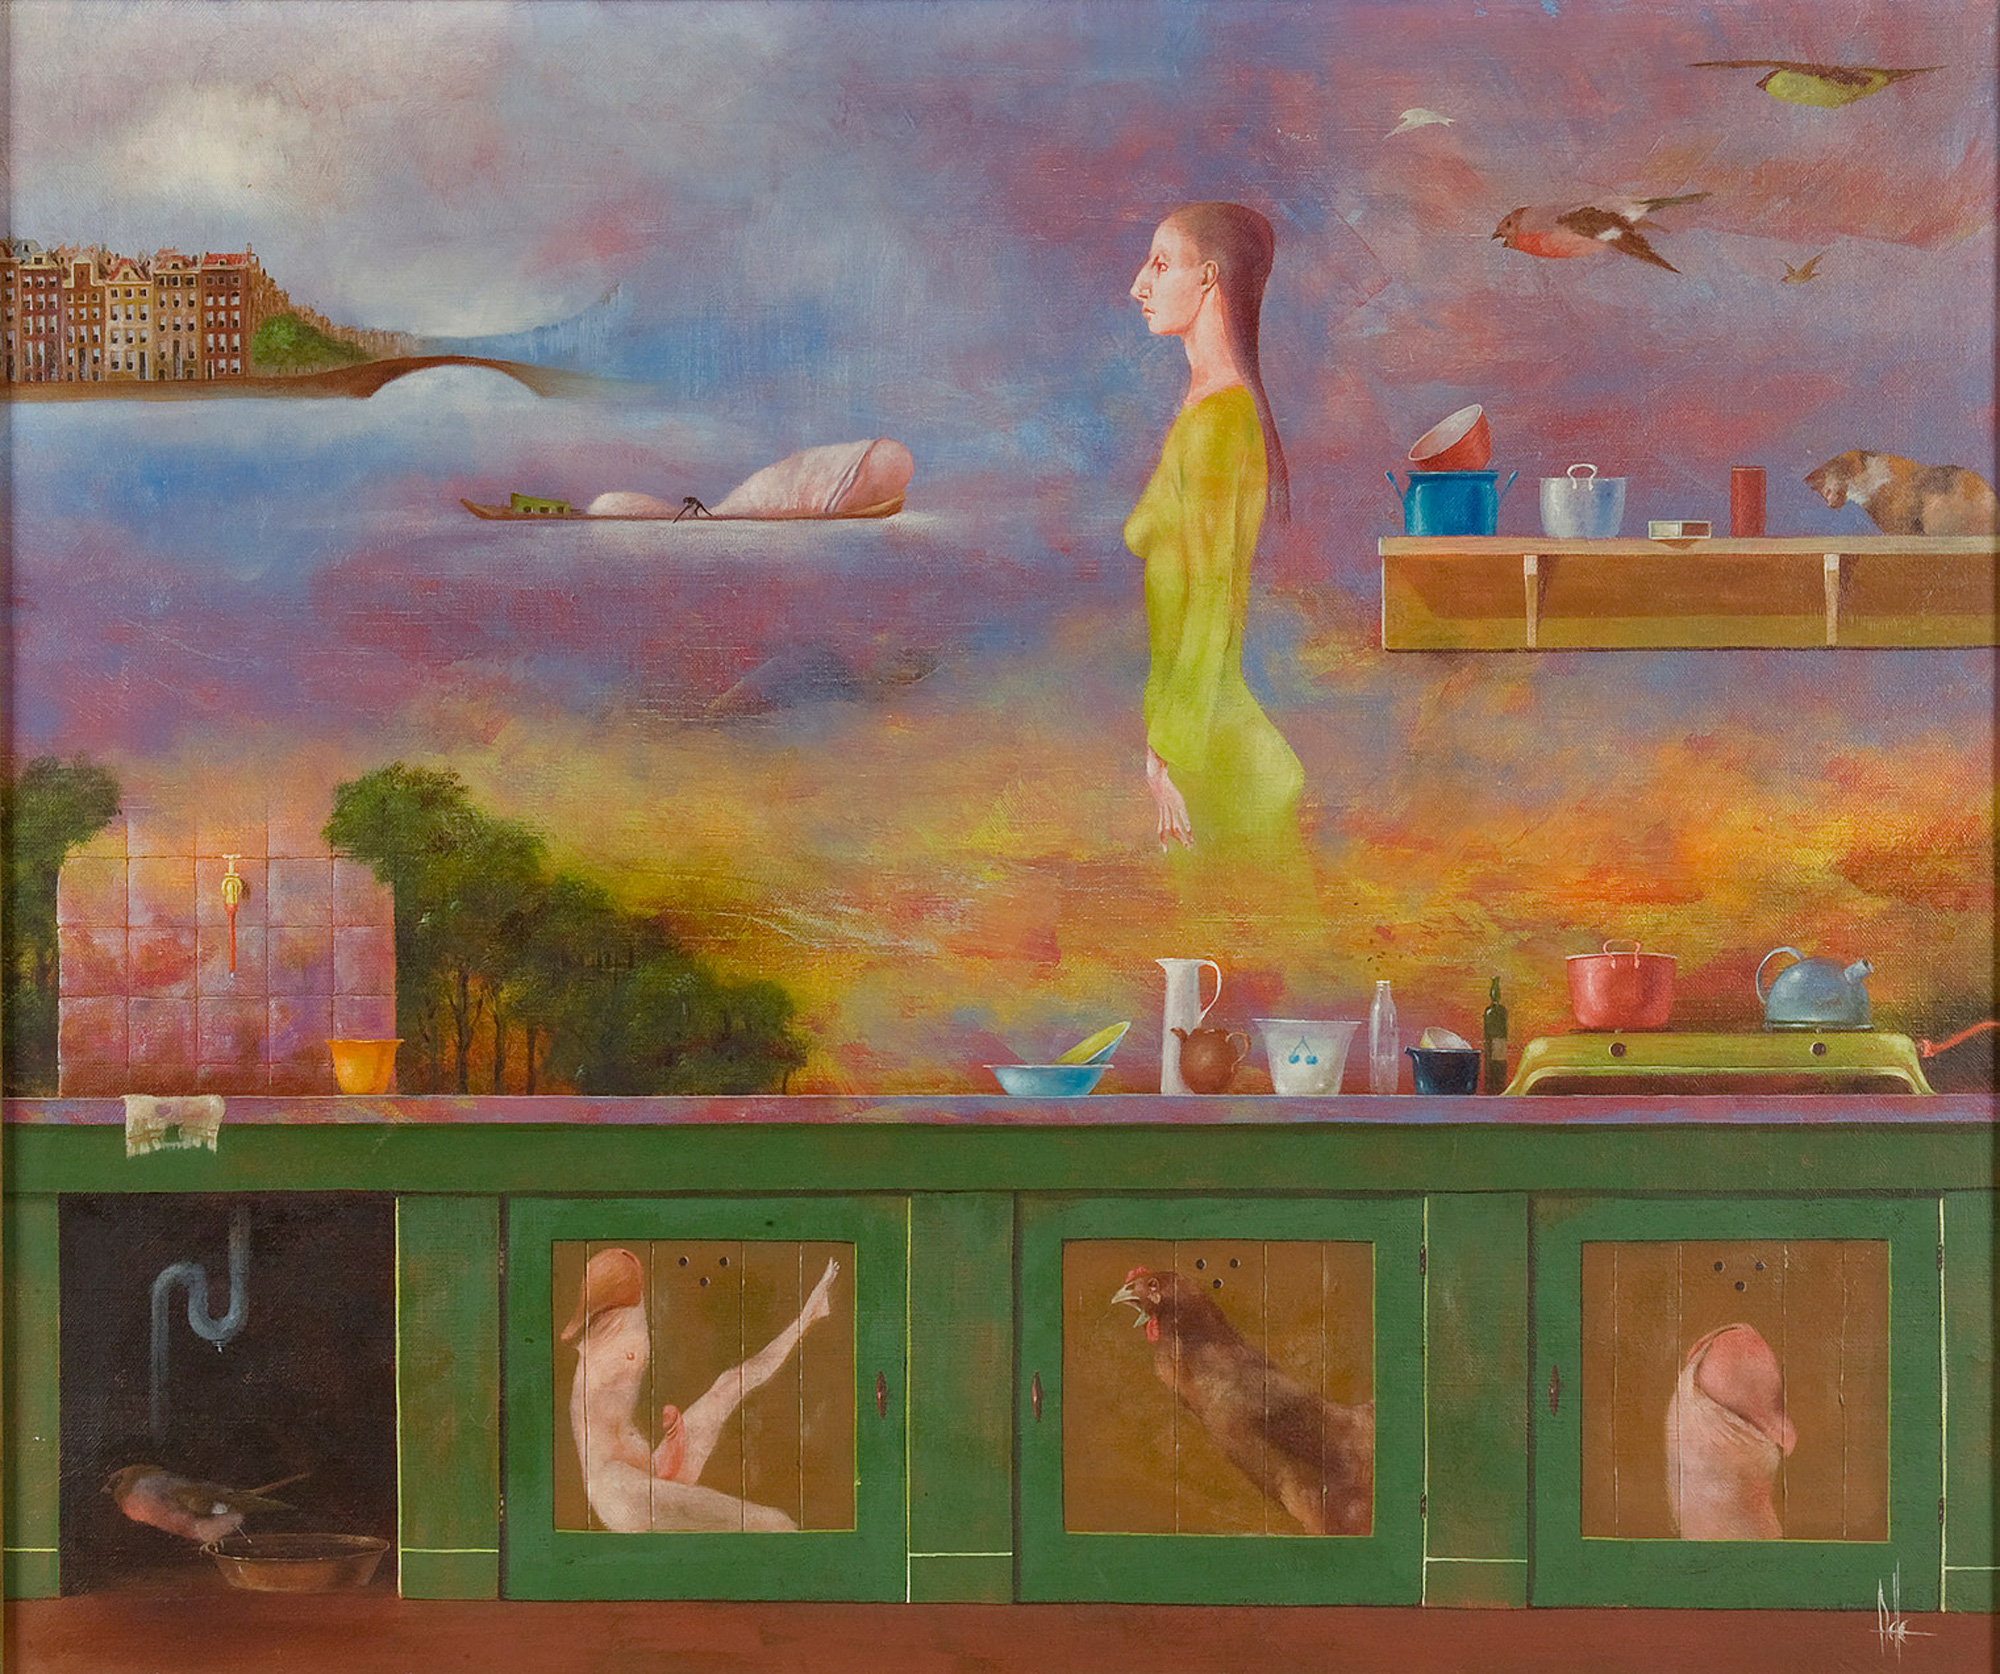 Melle schilder | Keukentje VI, olieverf op linnen